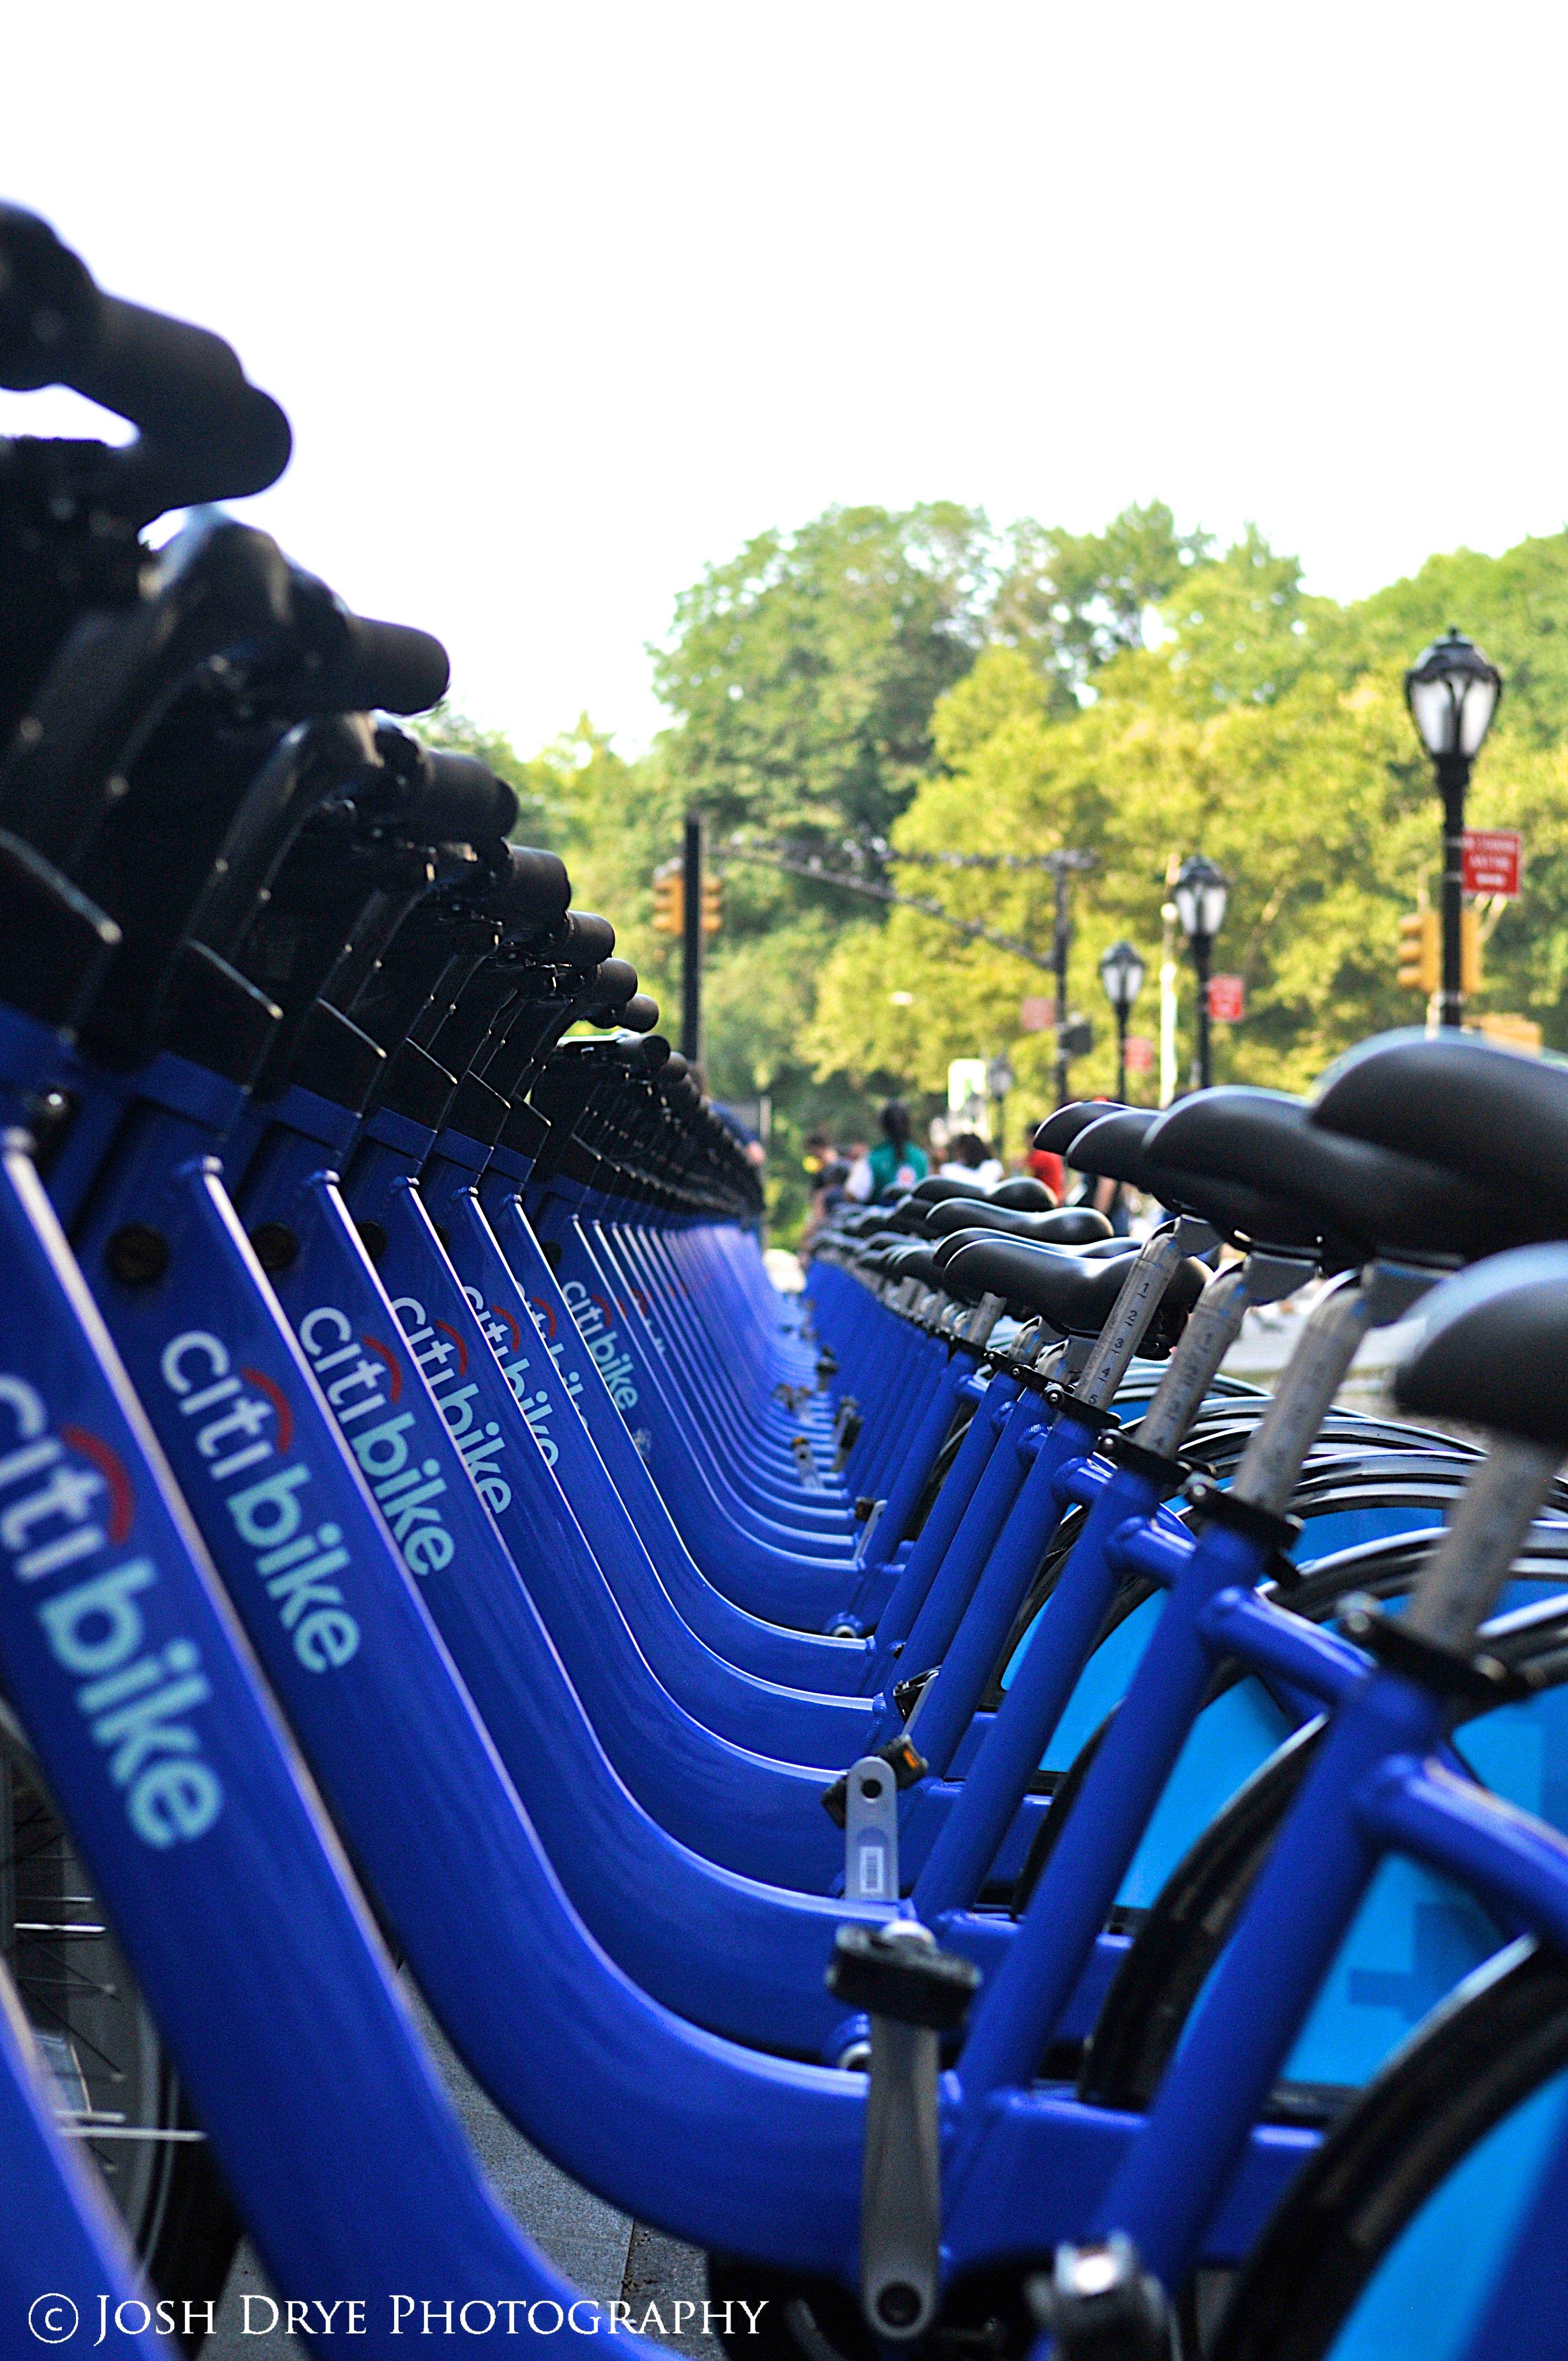 Bike rentals near central park new york city usa